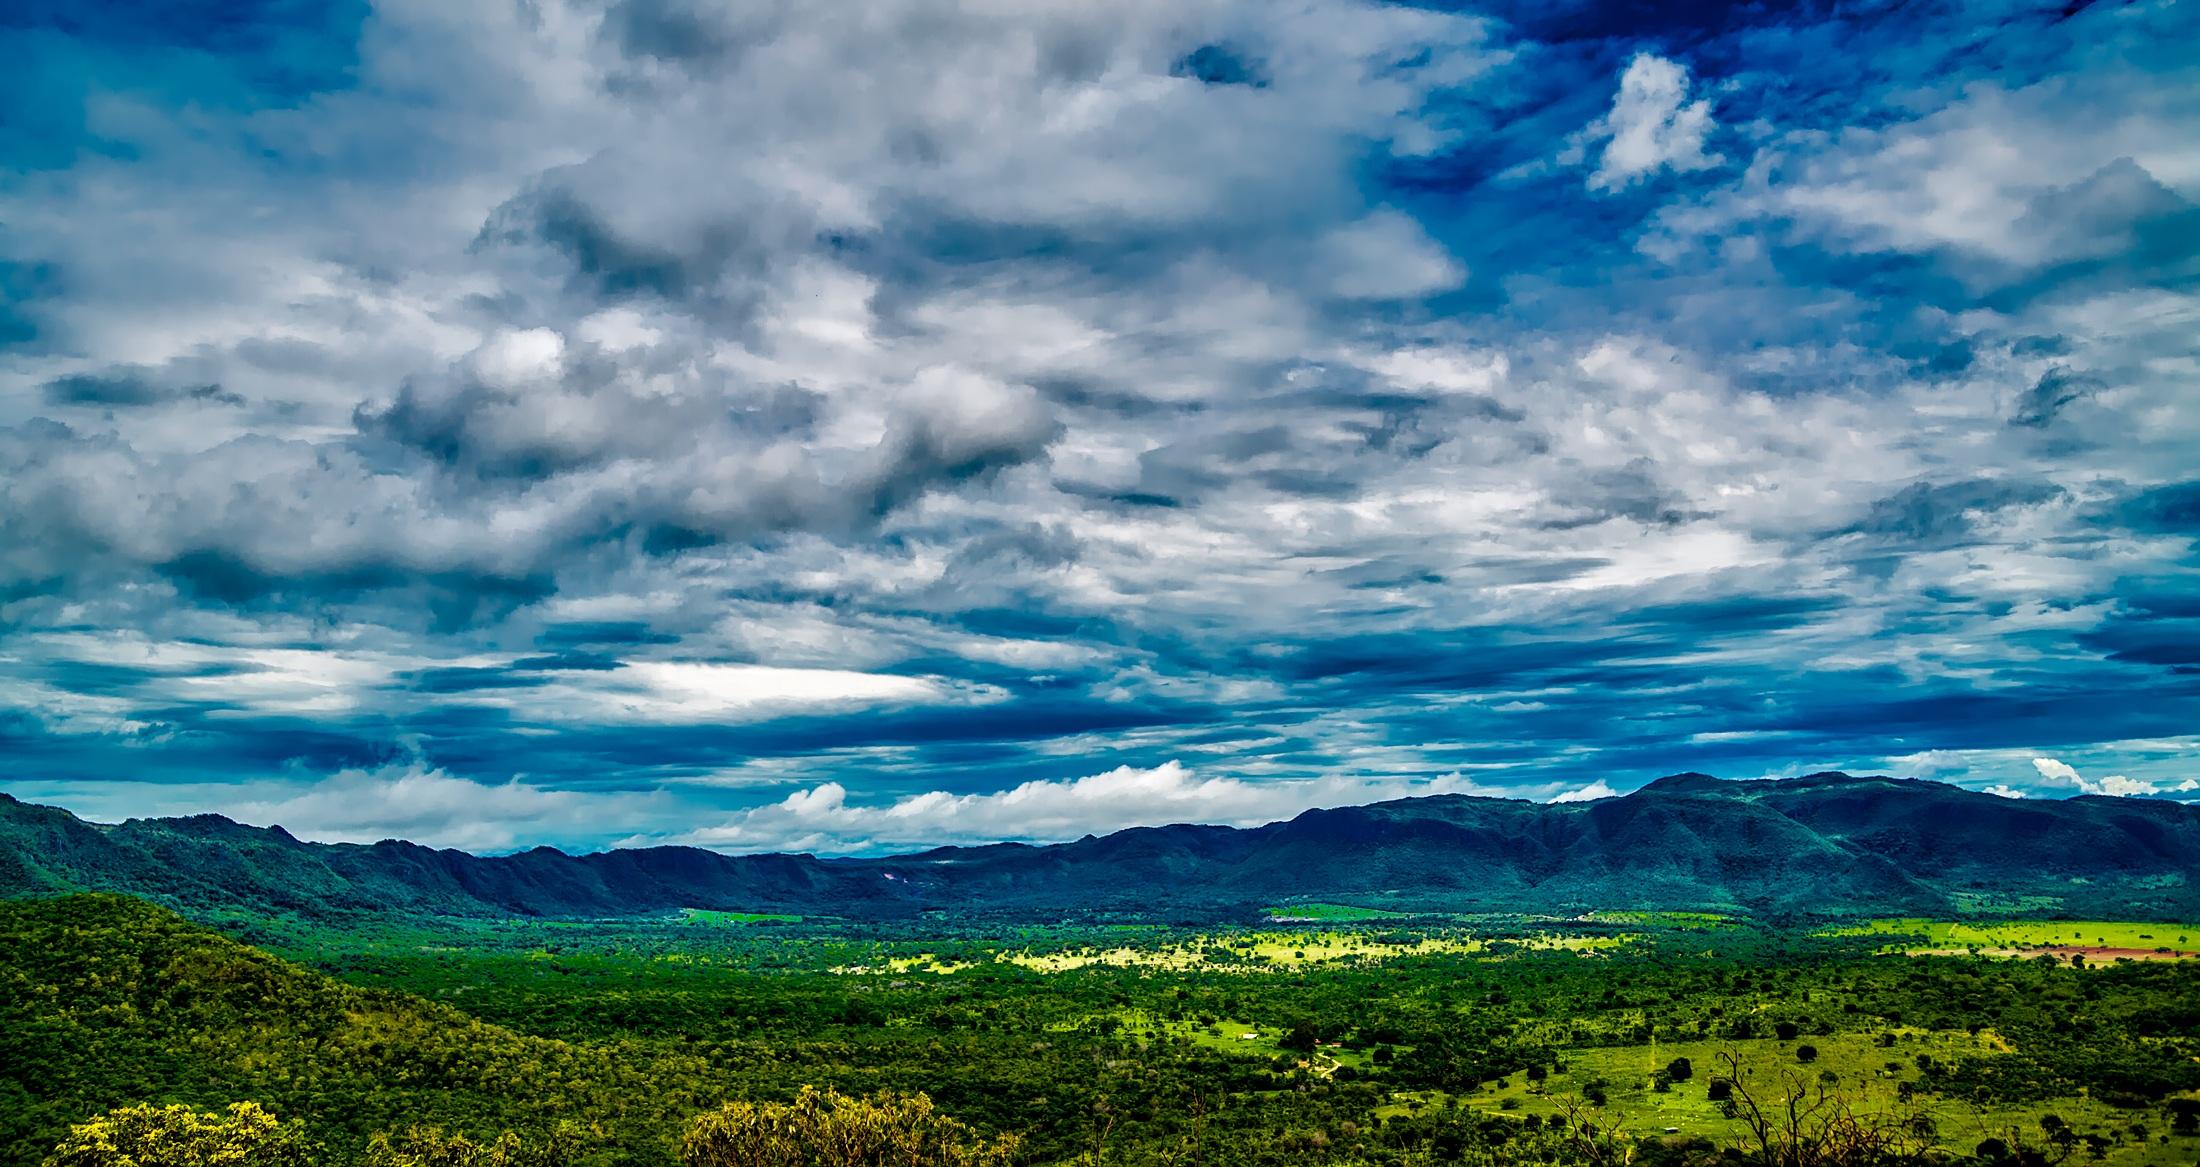 Gambar Pemandangan Hutan Horison Gurun Gunung Langit